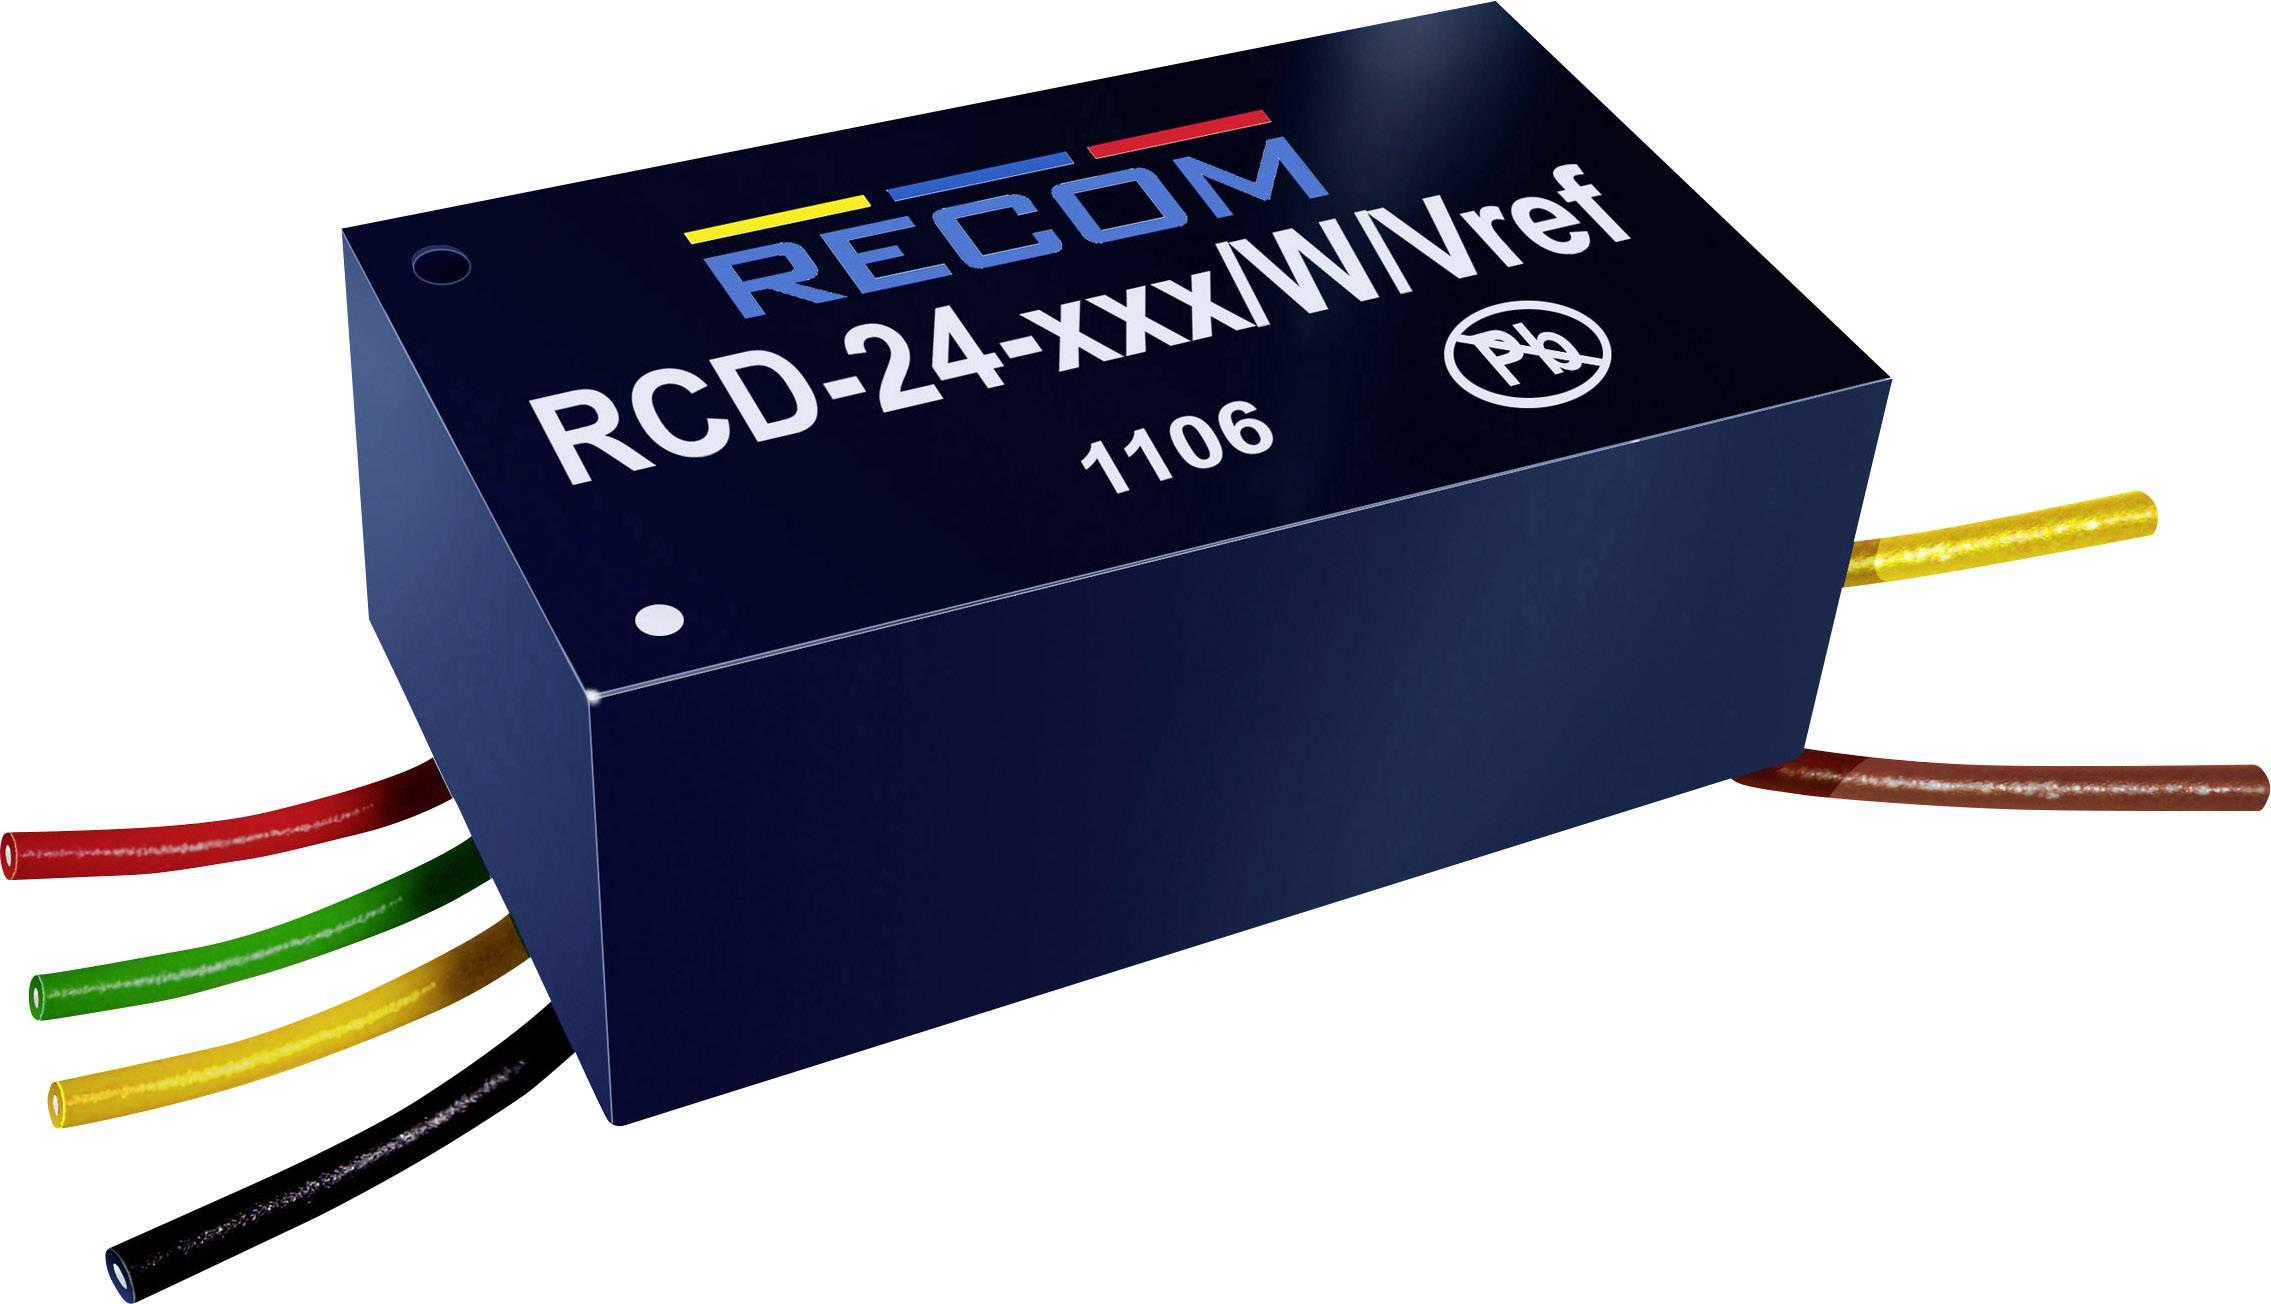 LED driver Recom Lighting RCD-24-0.30/W, kabel bez konektorů